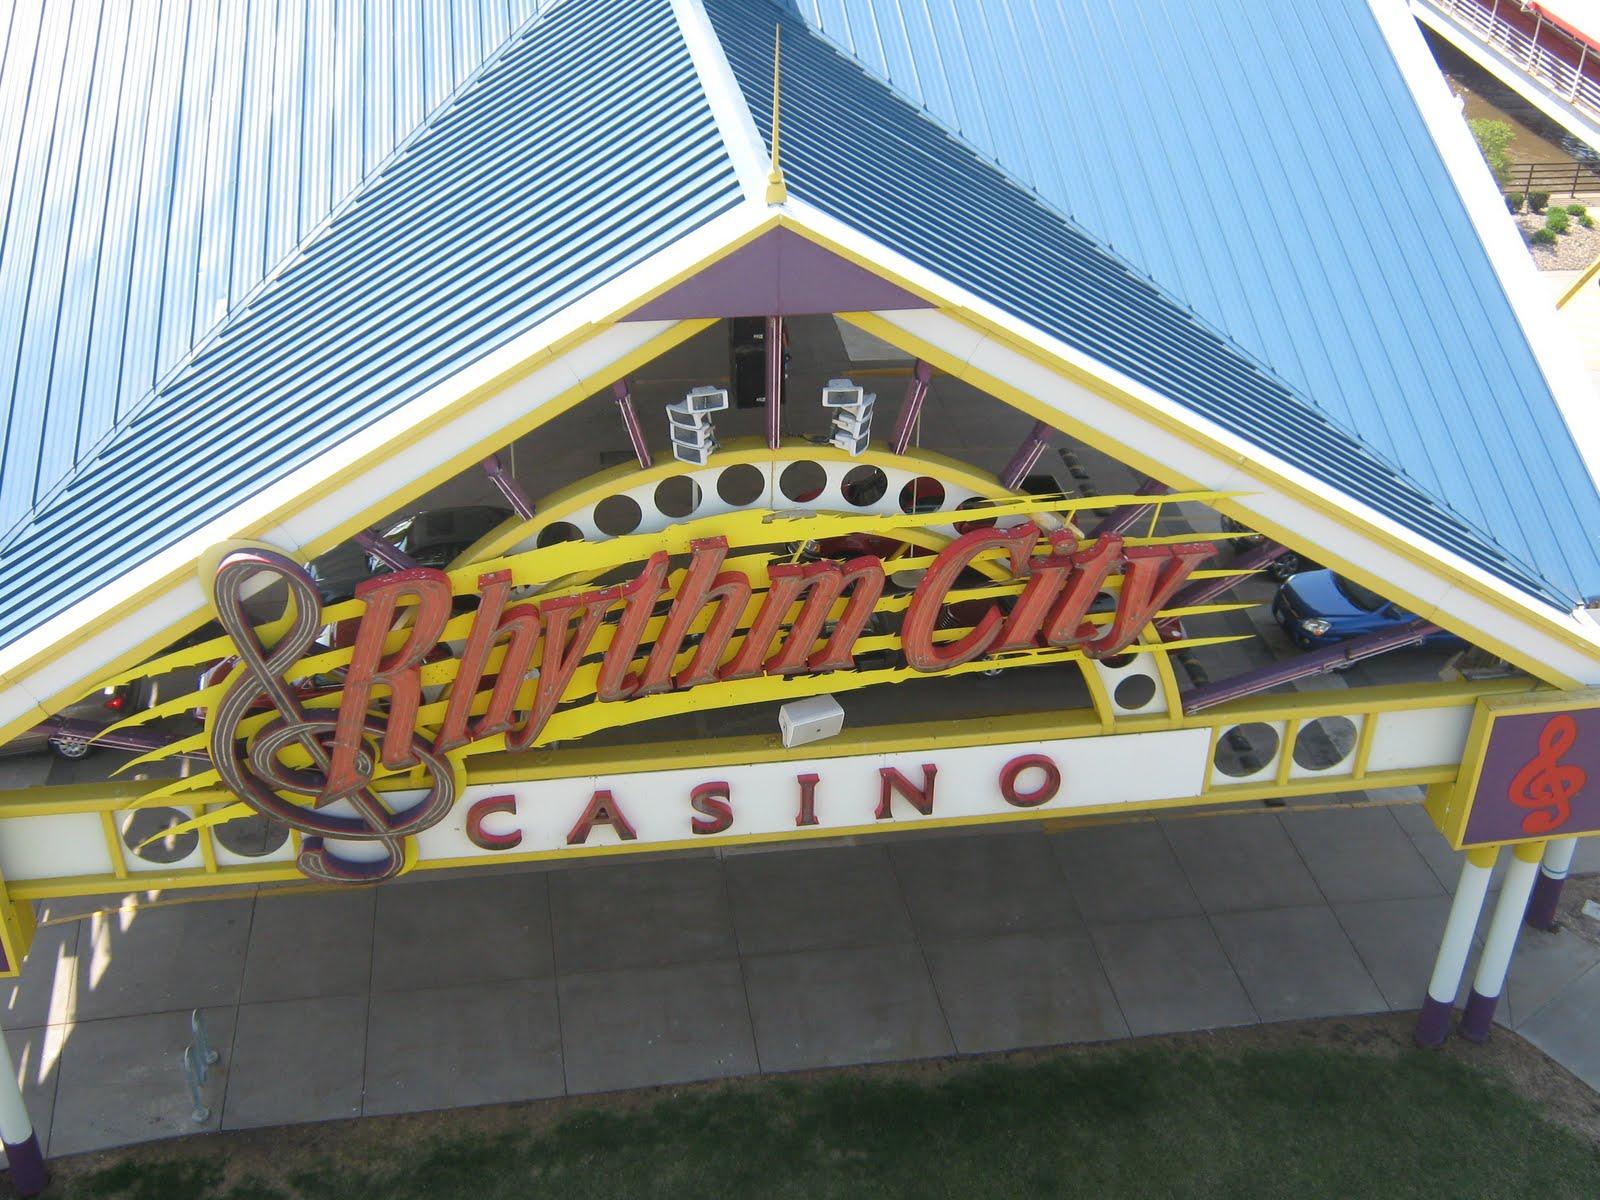 Isle of capri casino davenport 11